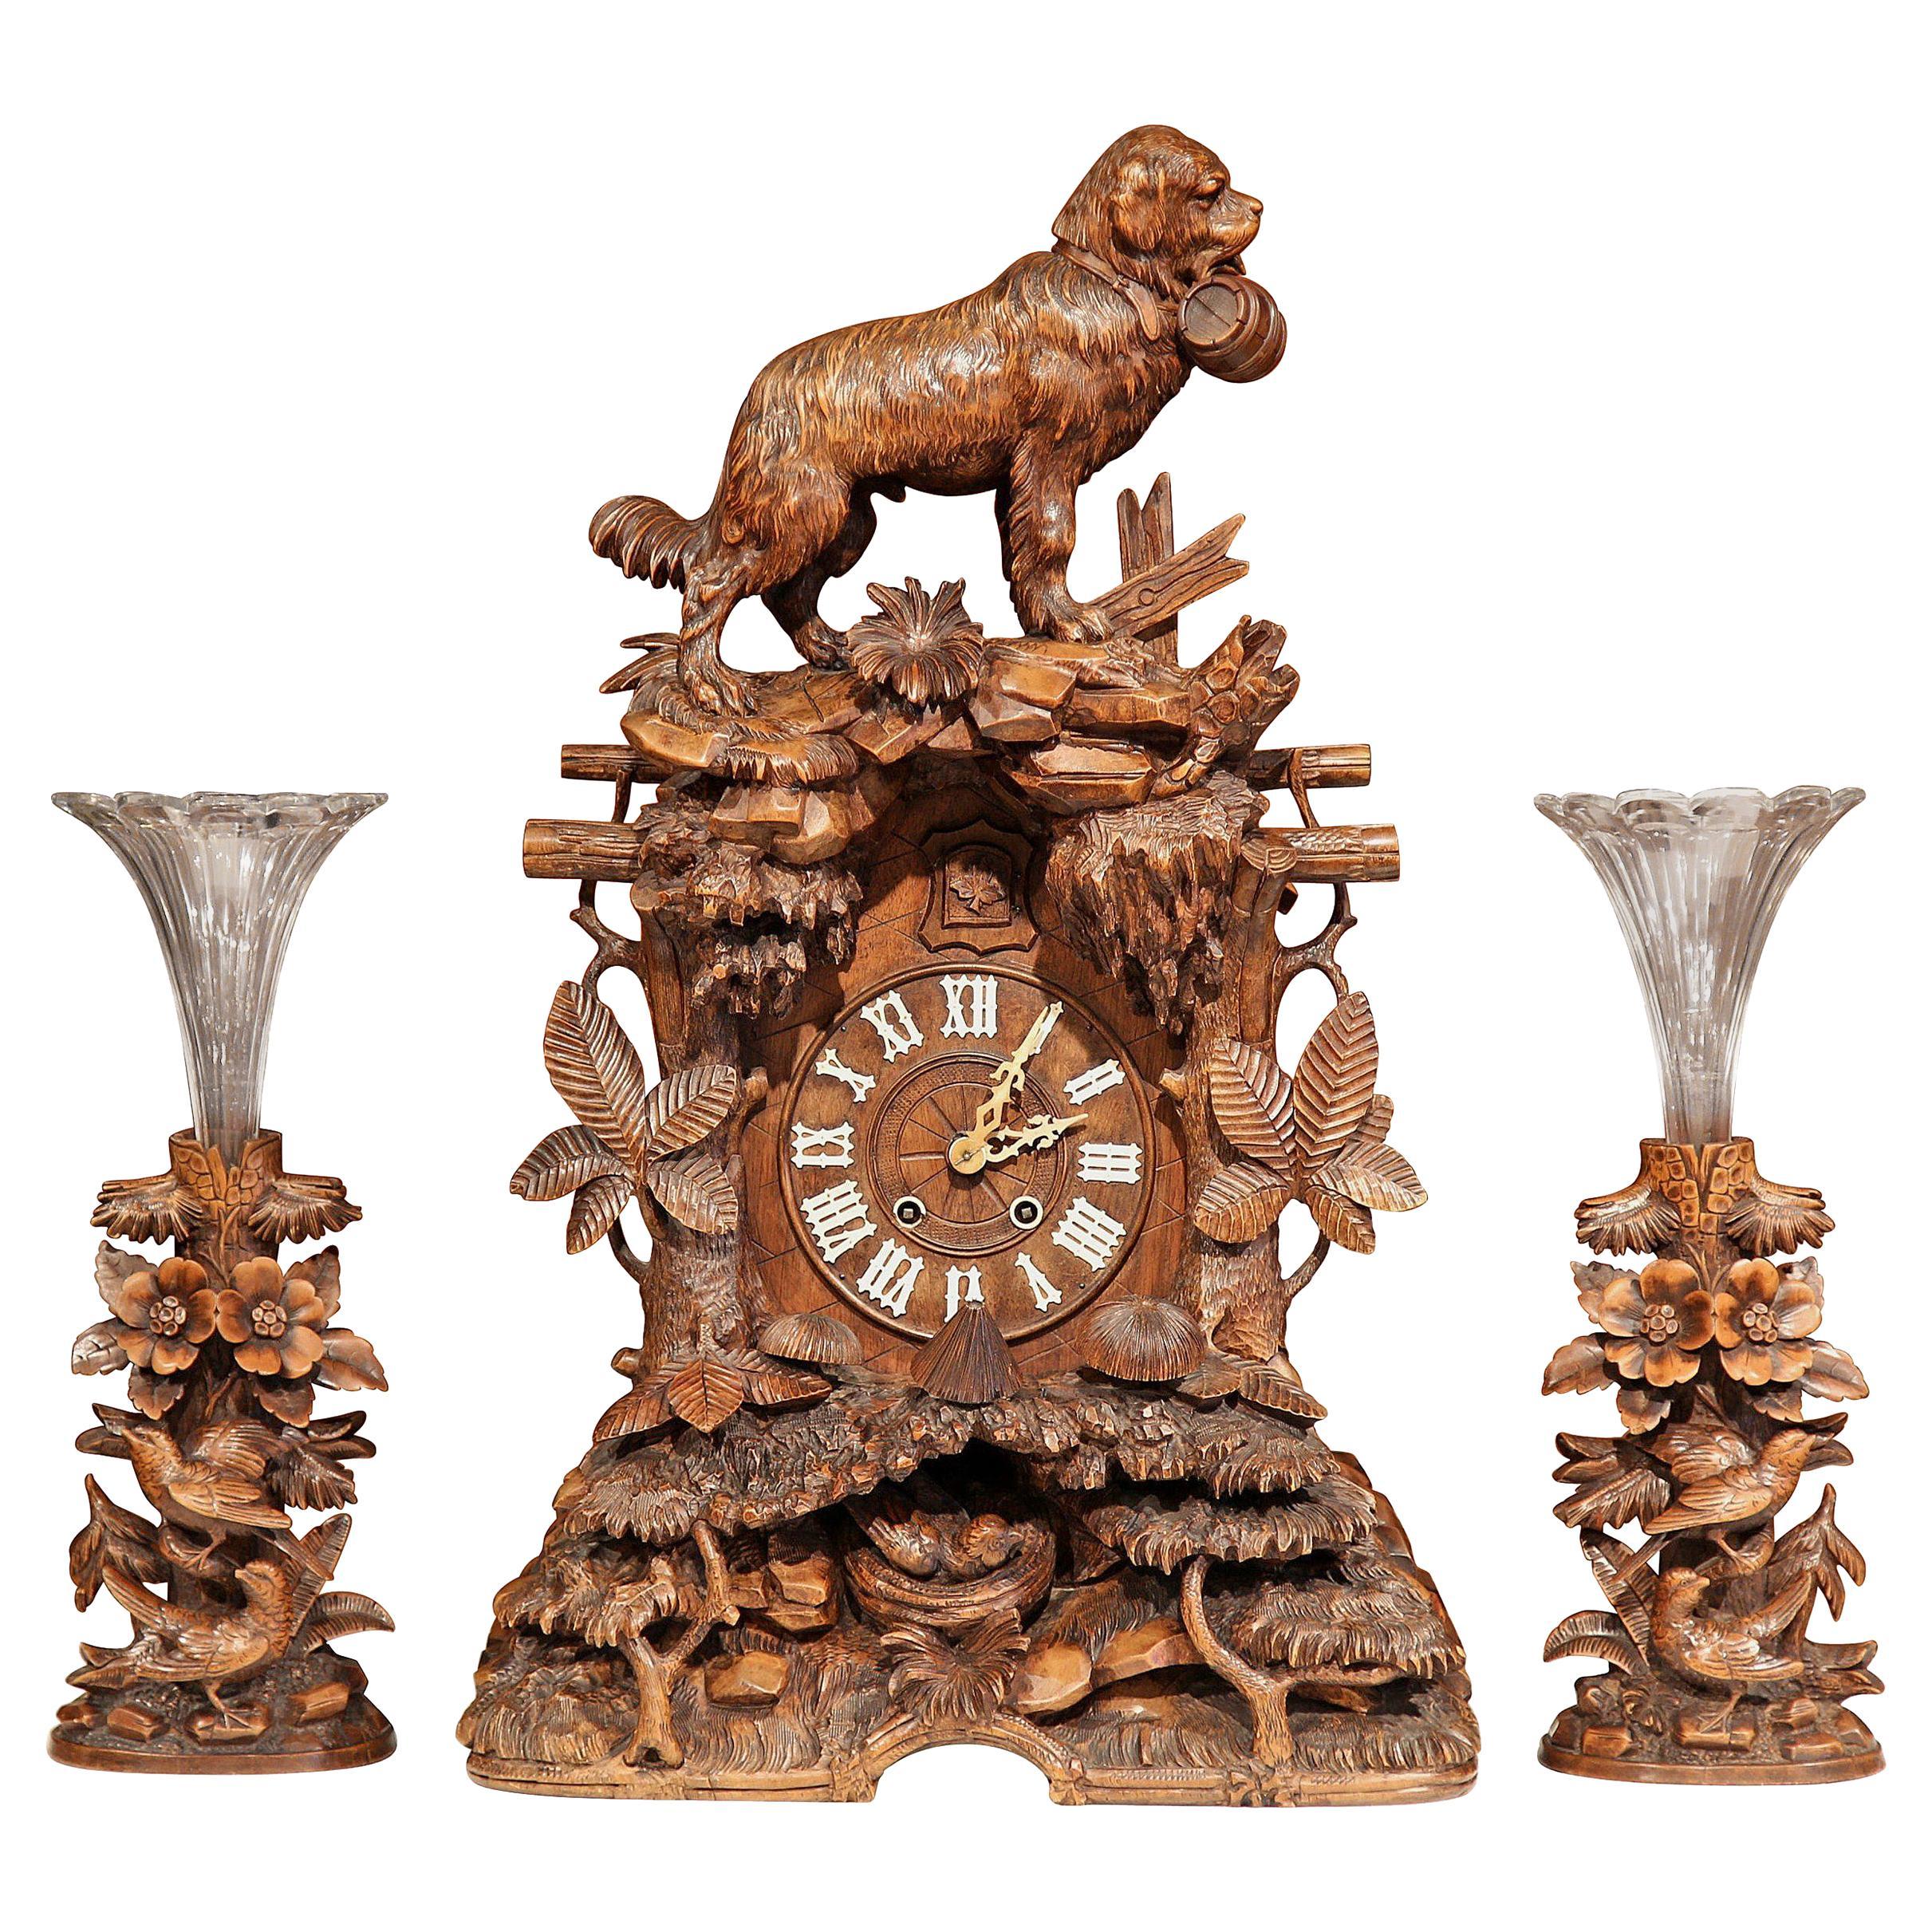 19th Century Swiss Black Forest Carved Walnut Three-Piece Mantel Clock Set